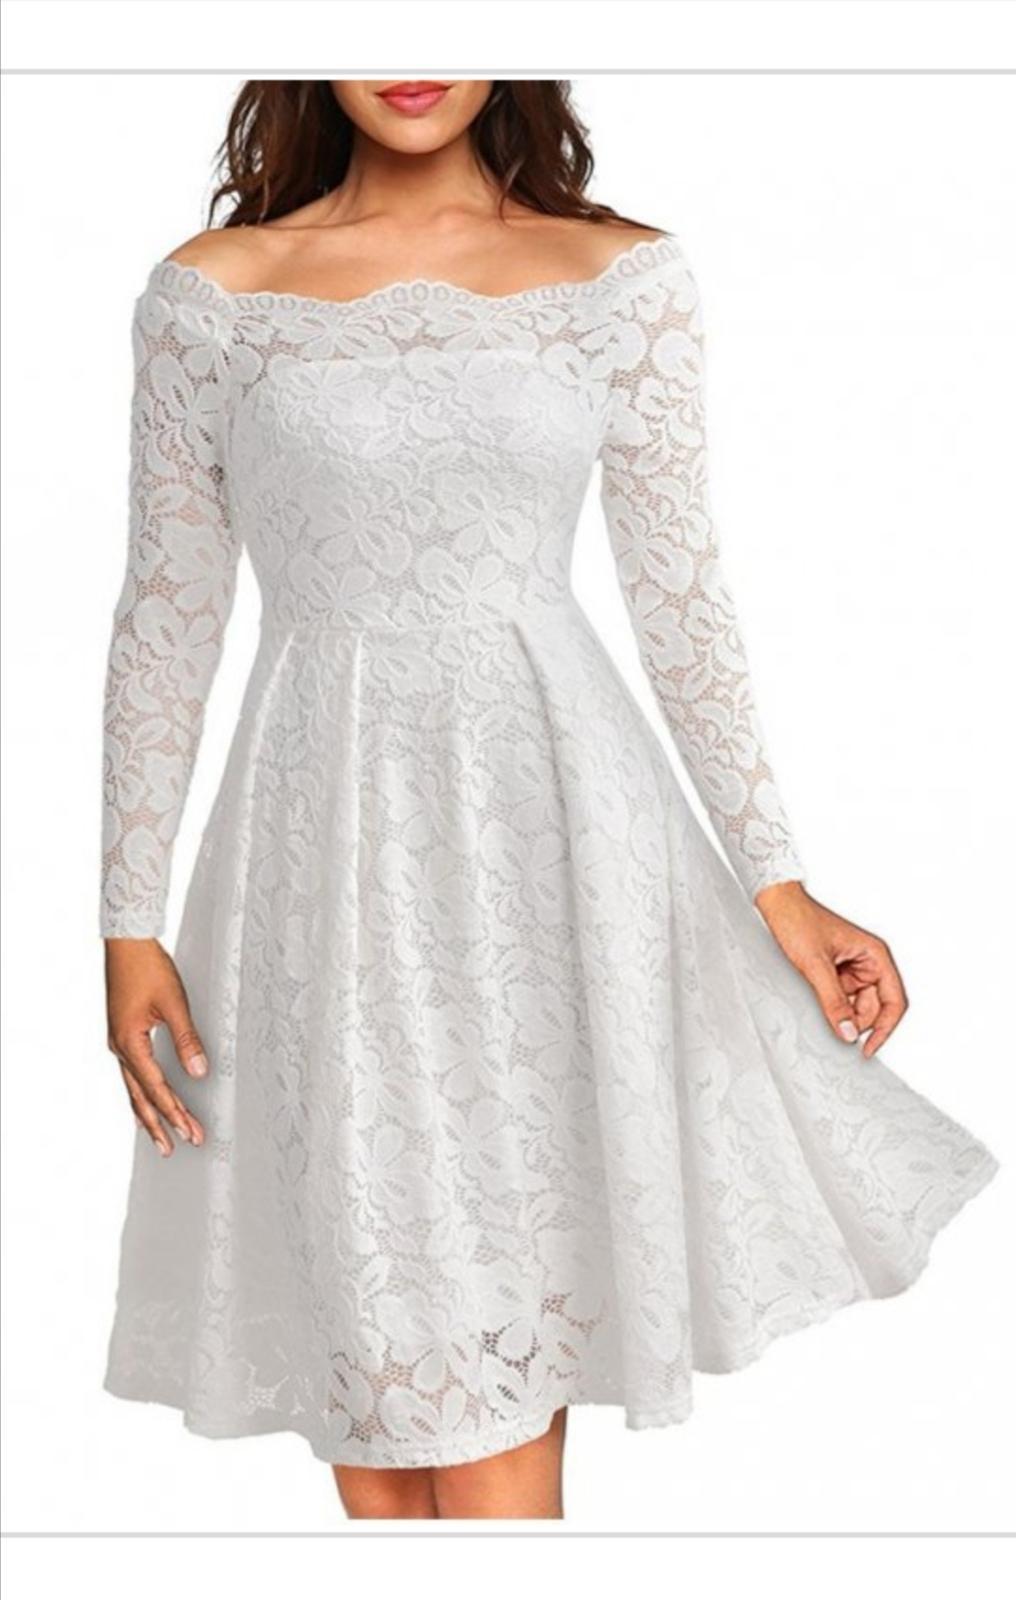 Biele čipkované šaty (nové) - Obrázok č. 1